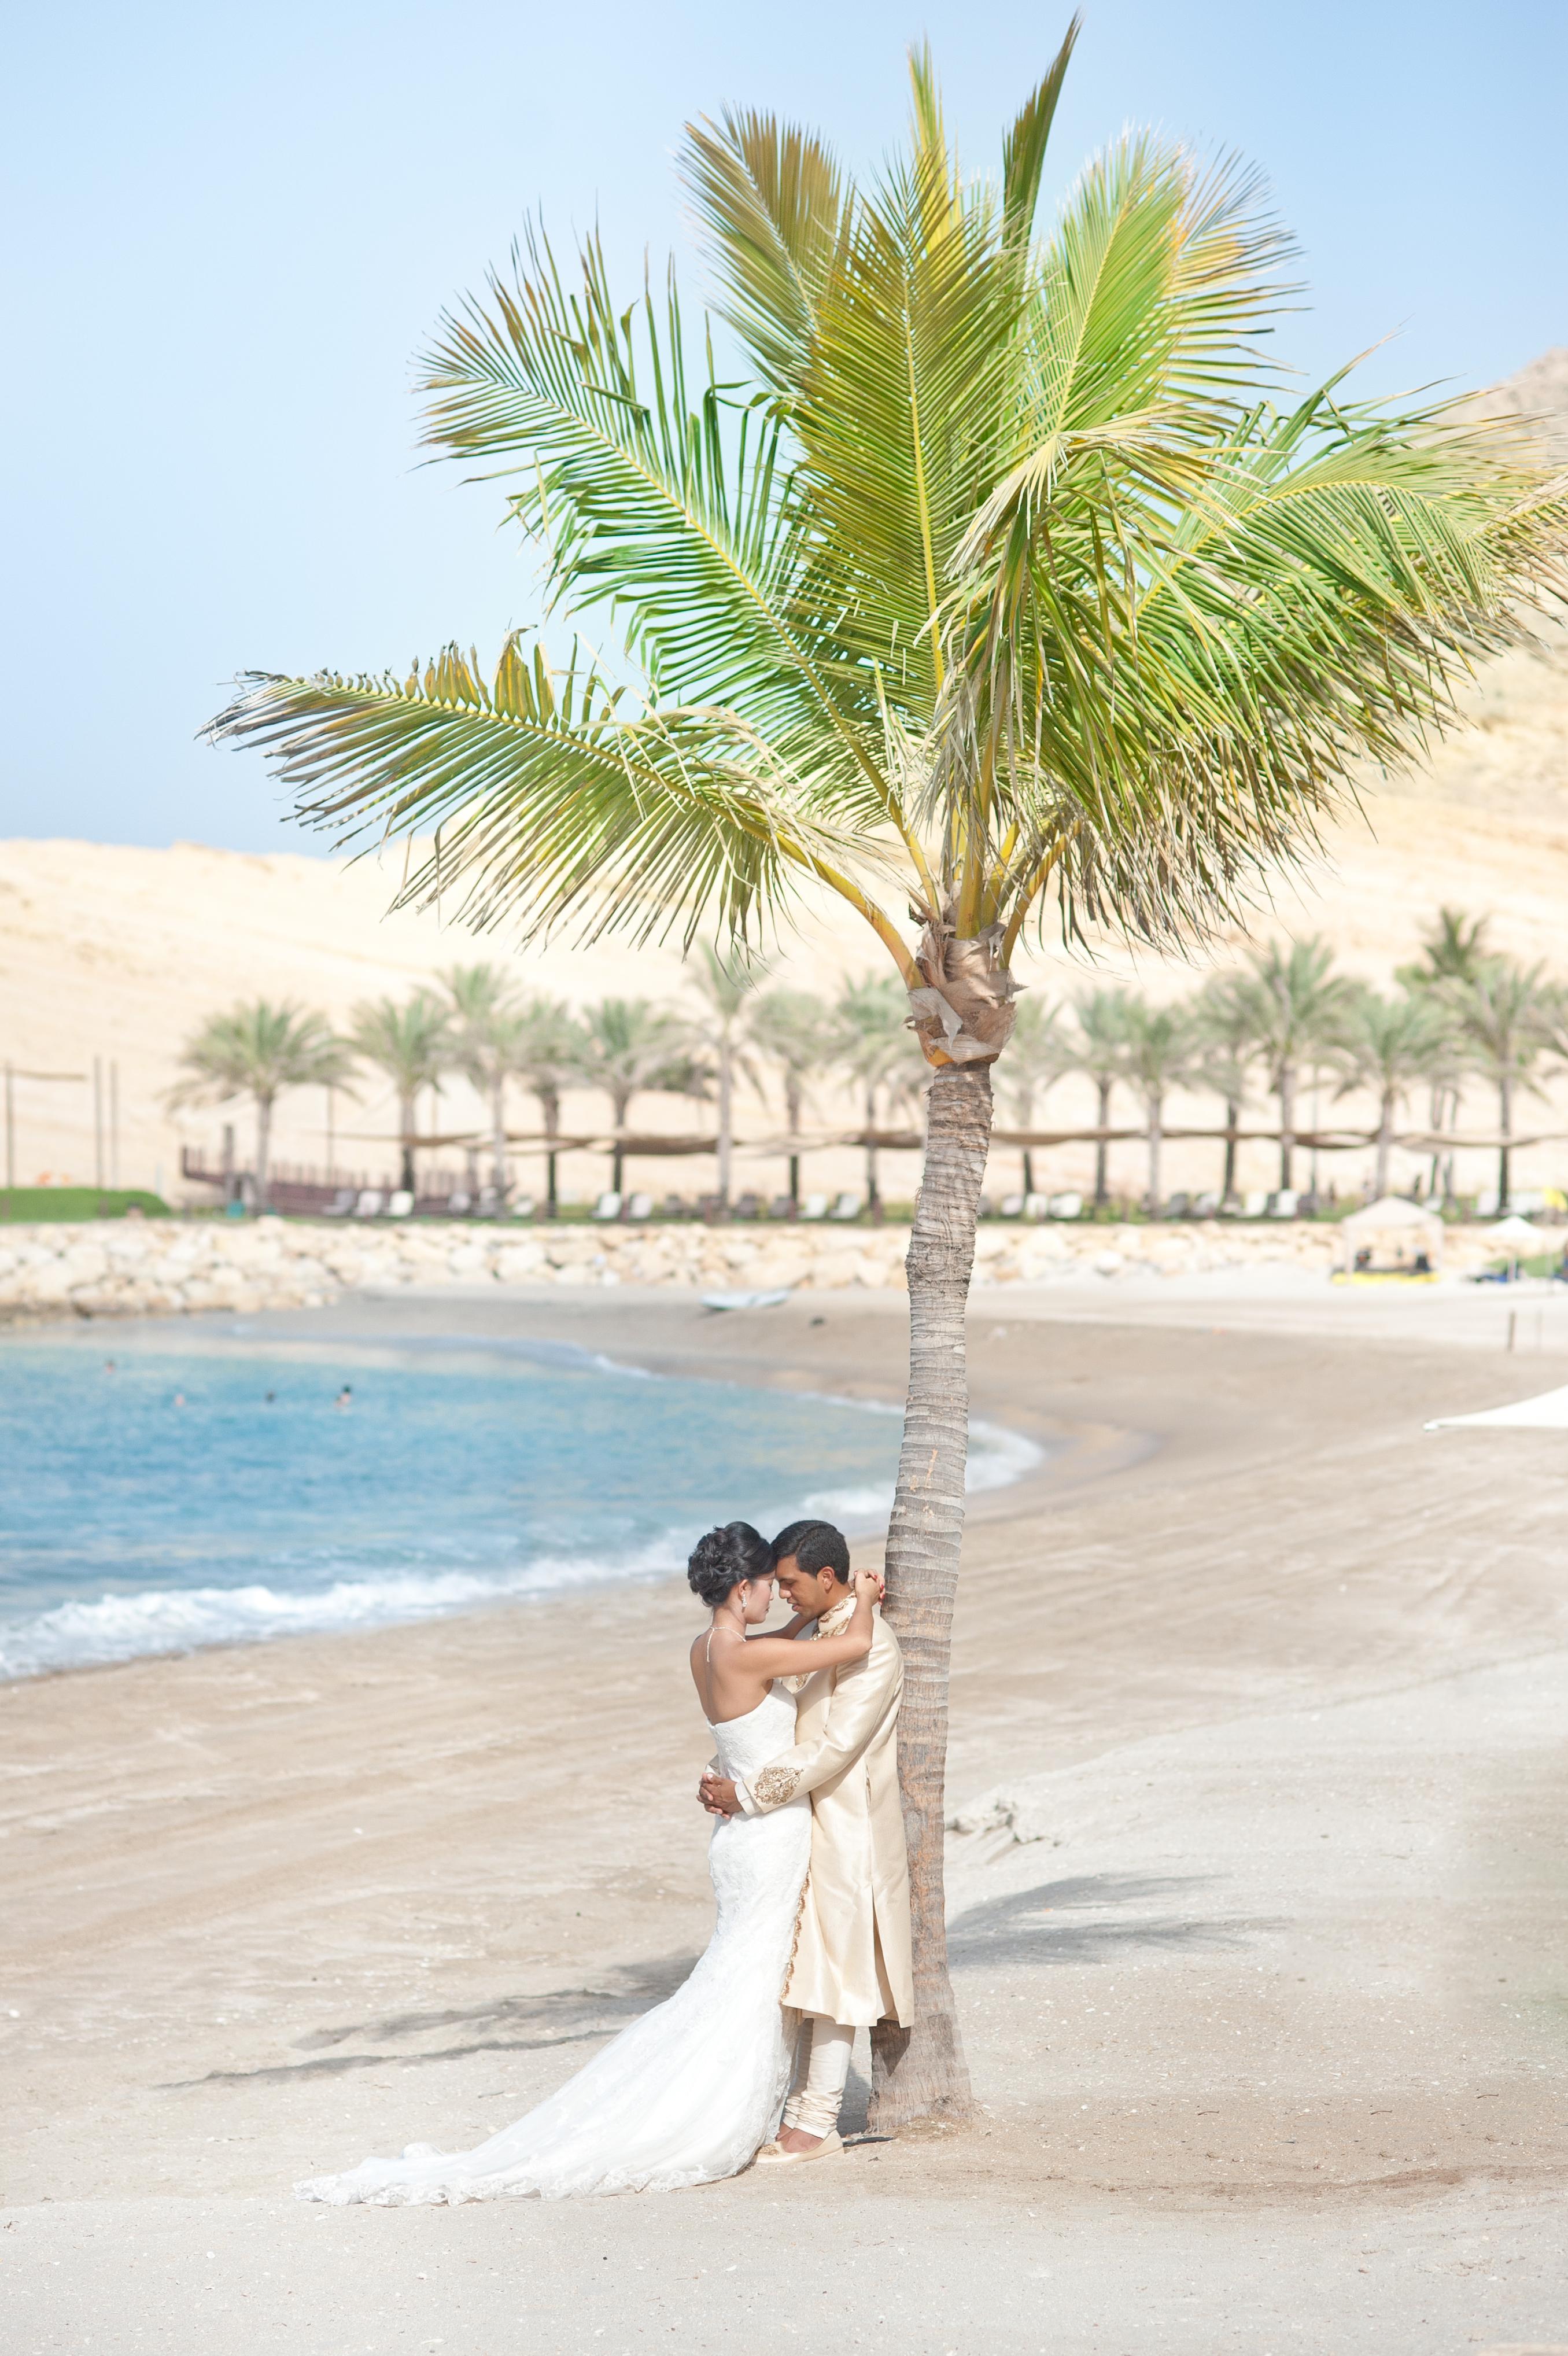 Oman-Dubai-Qatar-Photographer-003